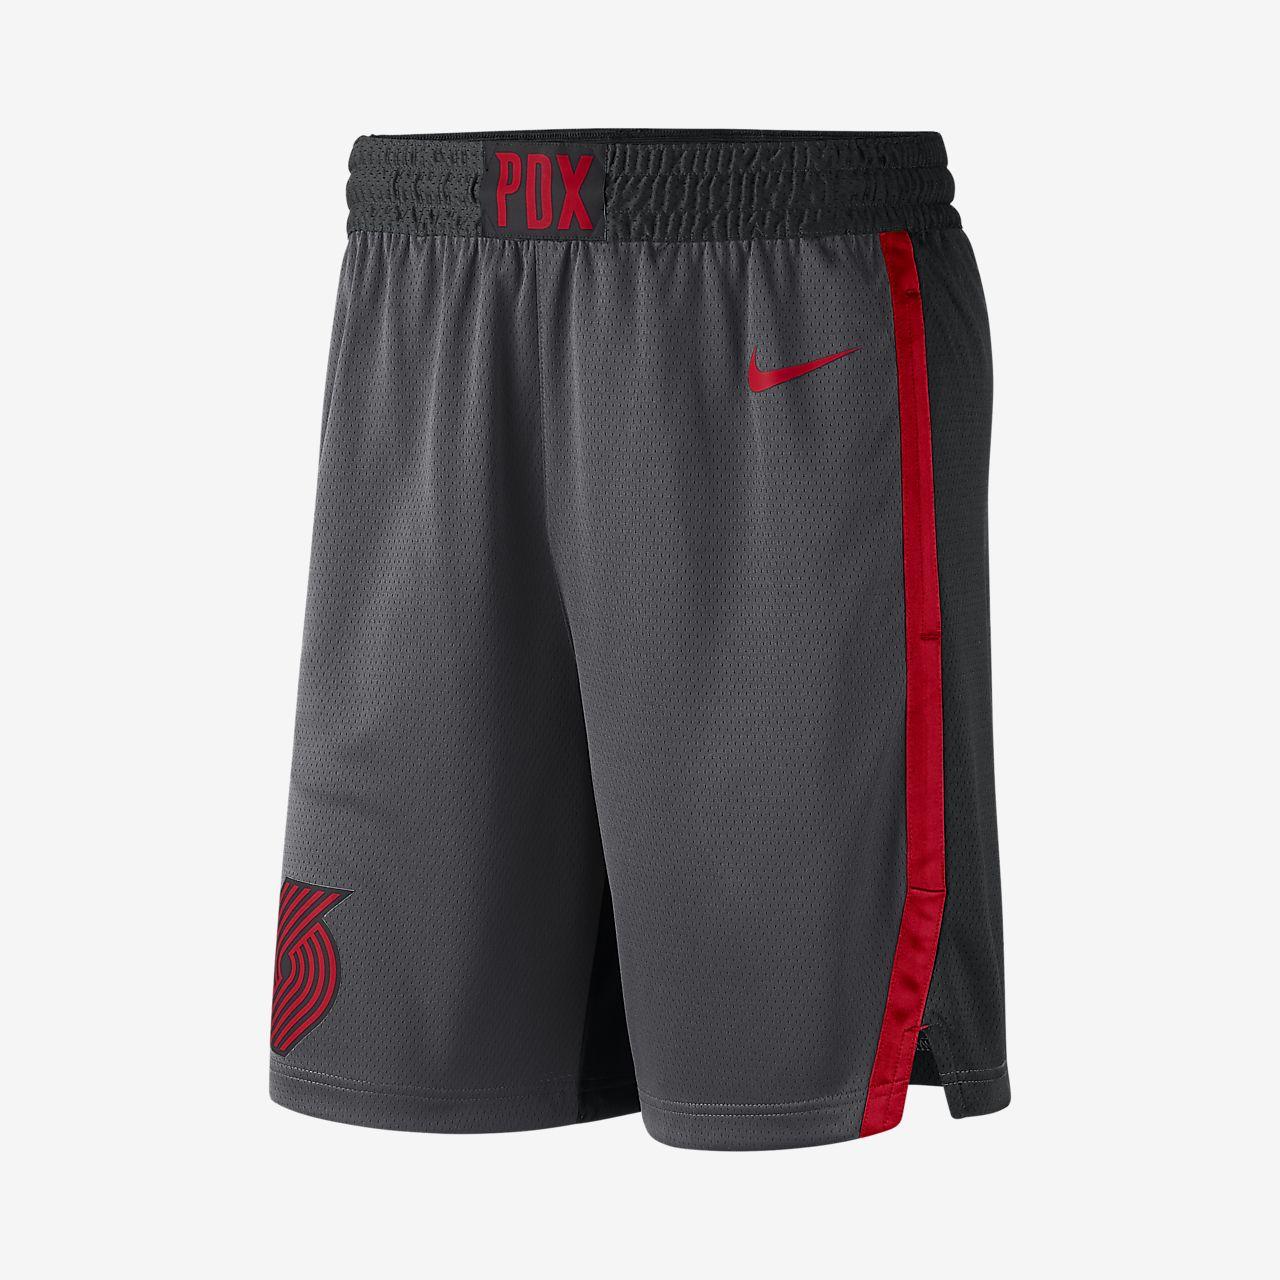 the best attitude f08a1 7c474 Portland Trail Blazers City Edition Swingman Men's Nike NBA Shorts